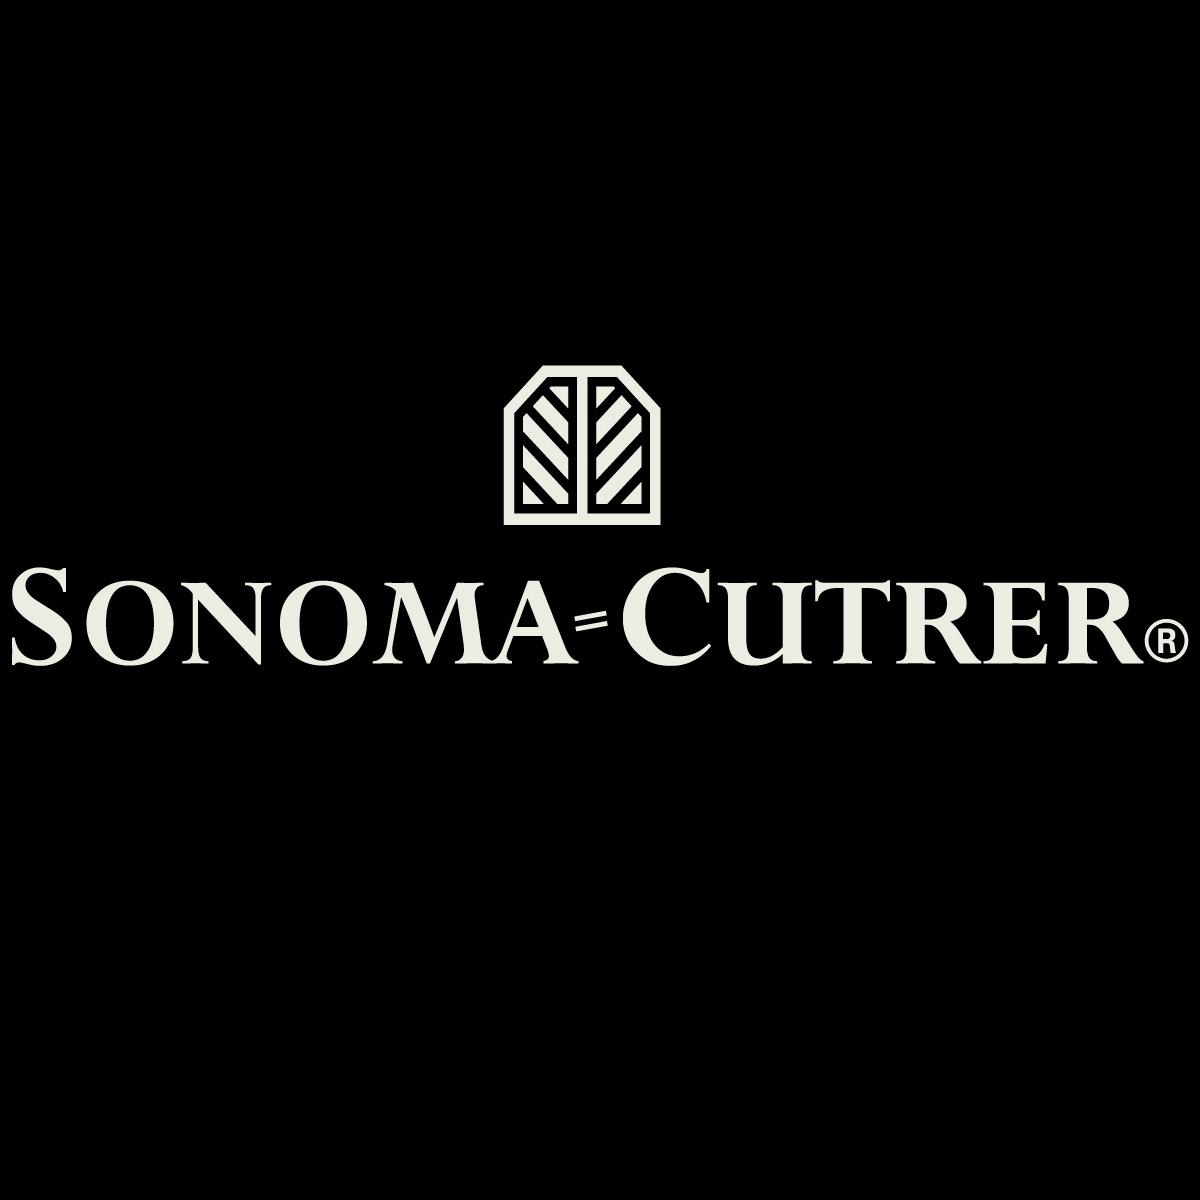 Sonoma Cutrer Logo